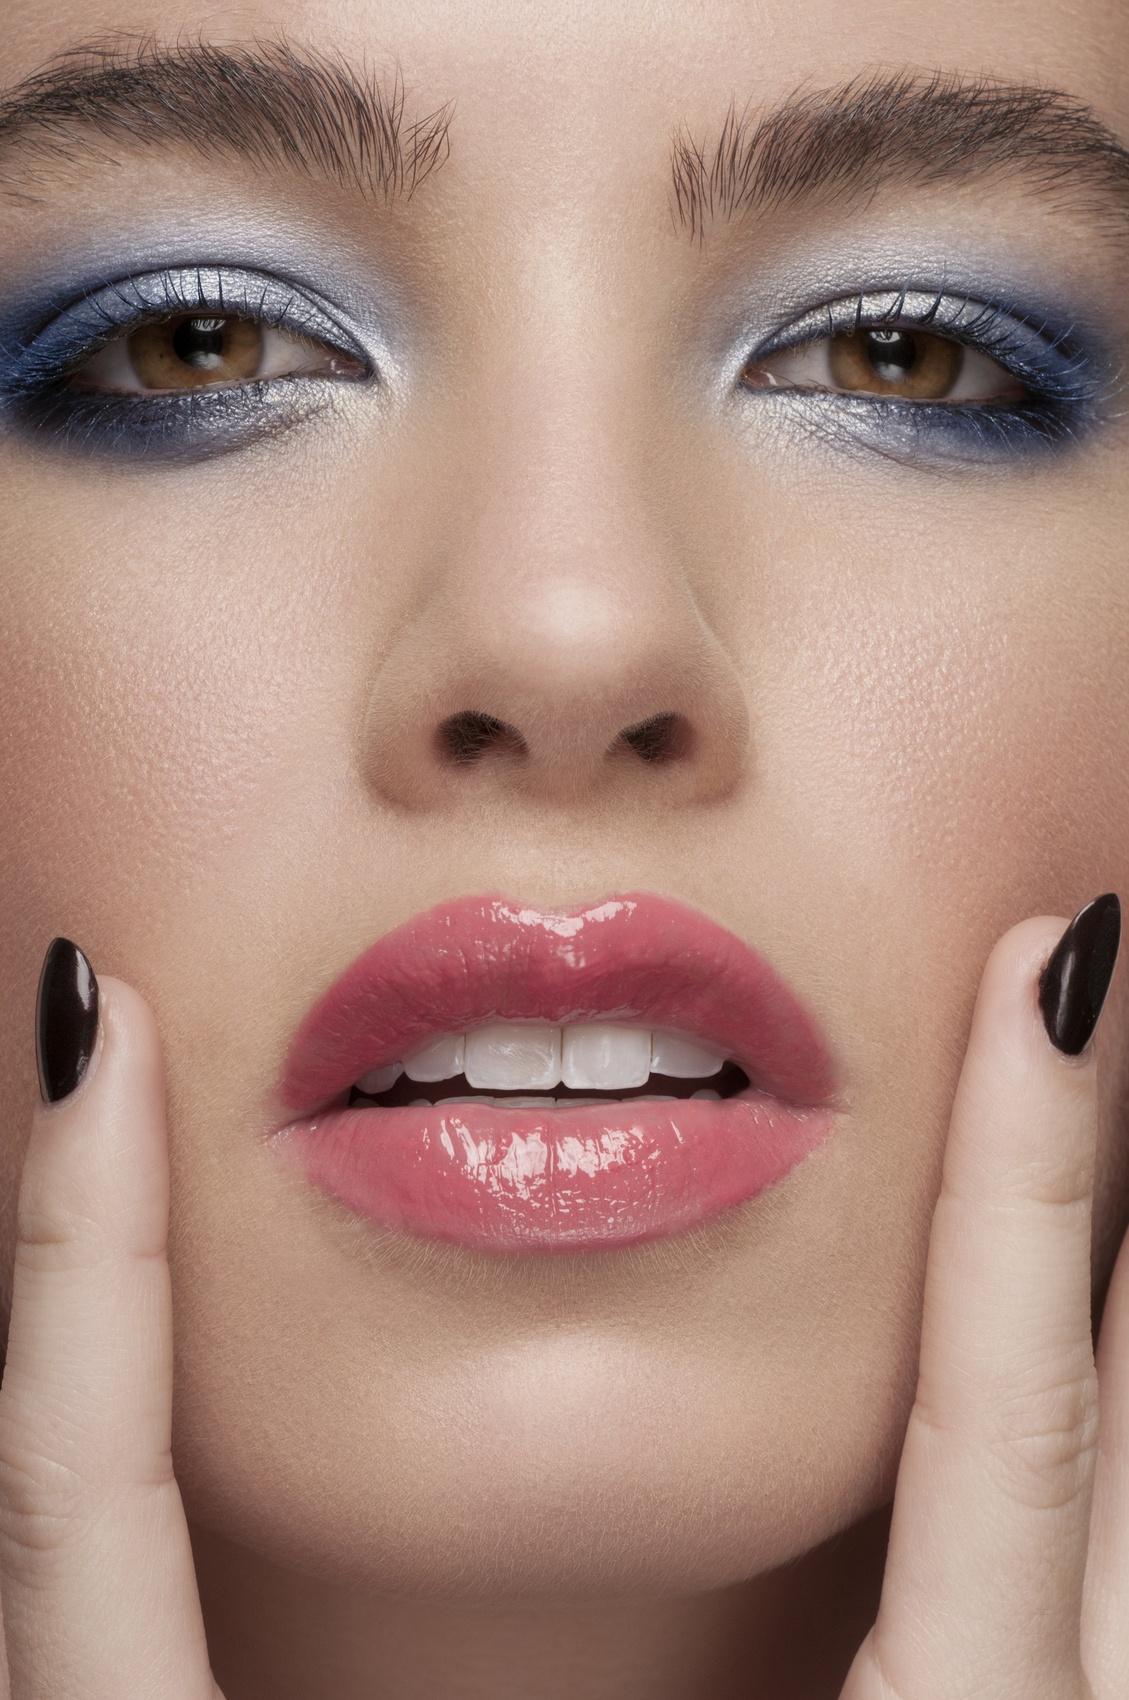 beauty close-up portrait of beautiful Caucasian woman in blue eye shadow